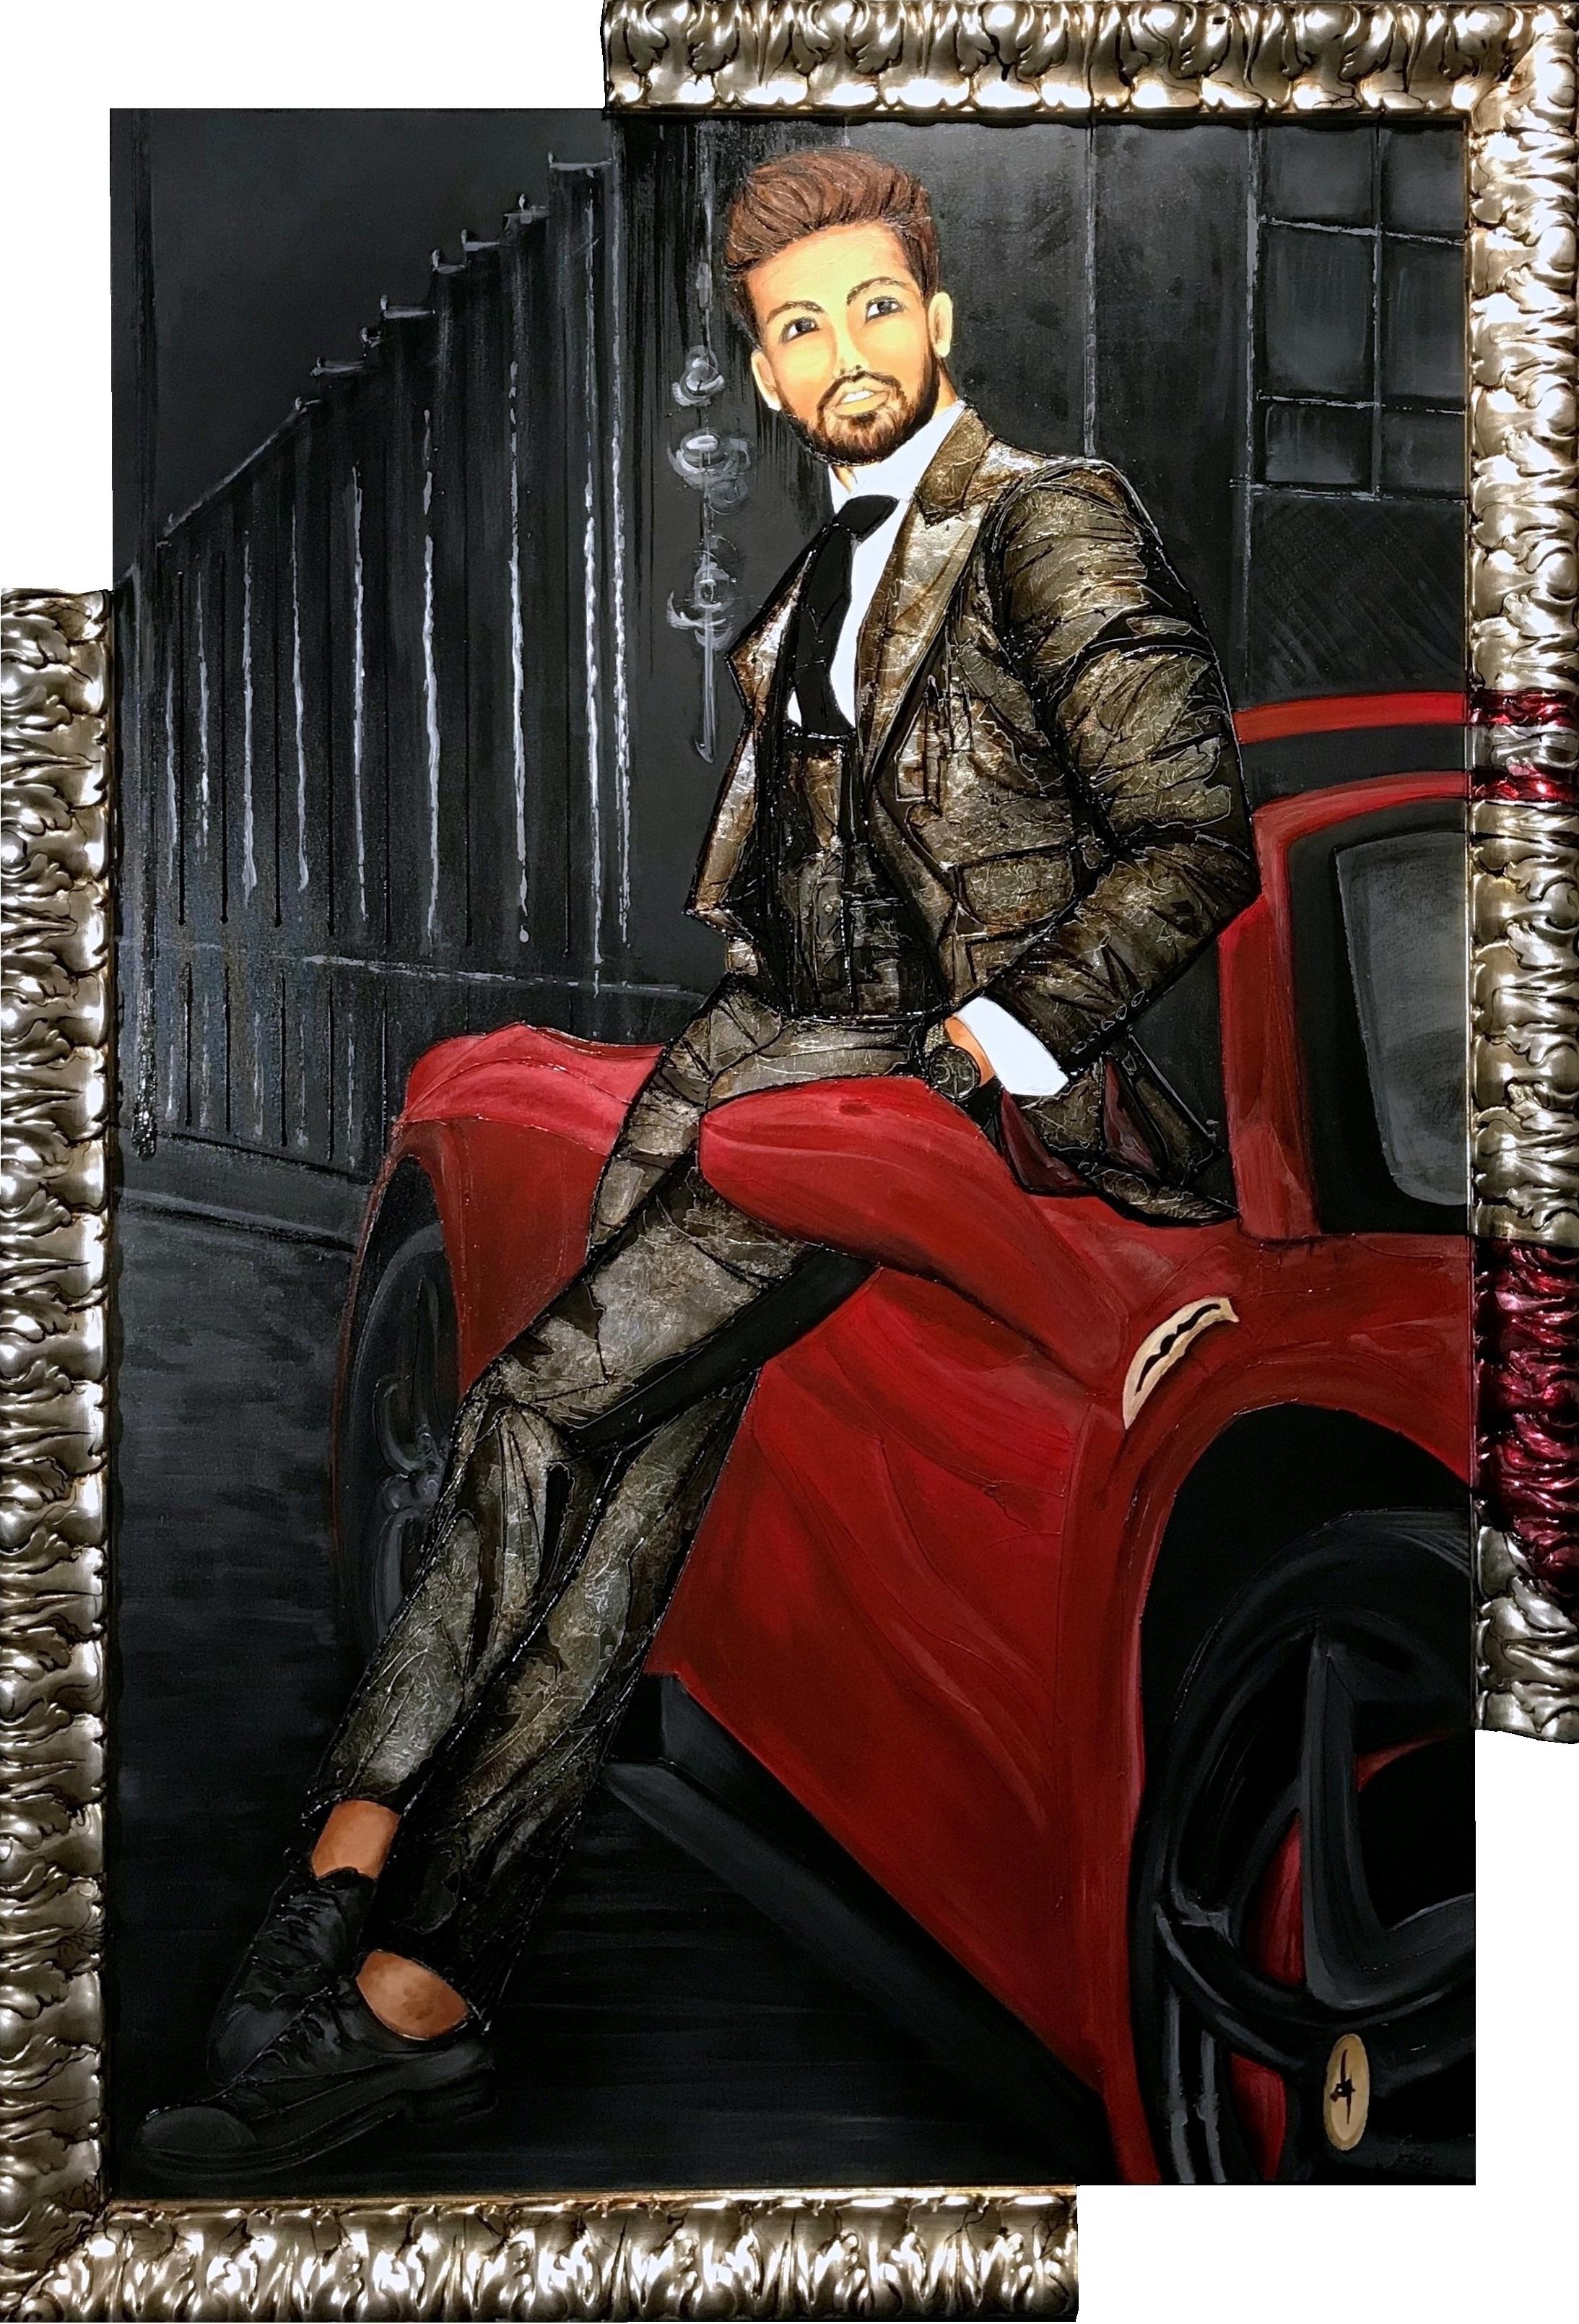 Paparazzo-Lover-II-by-Sonia-Domingues-Sonny-s-Art.jpg